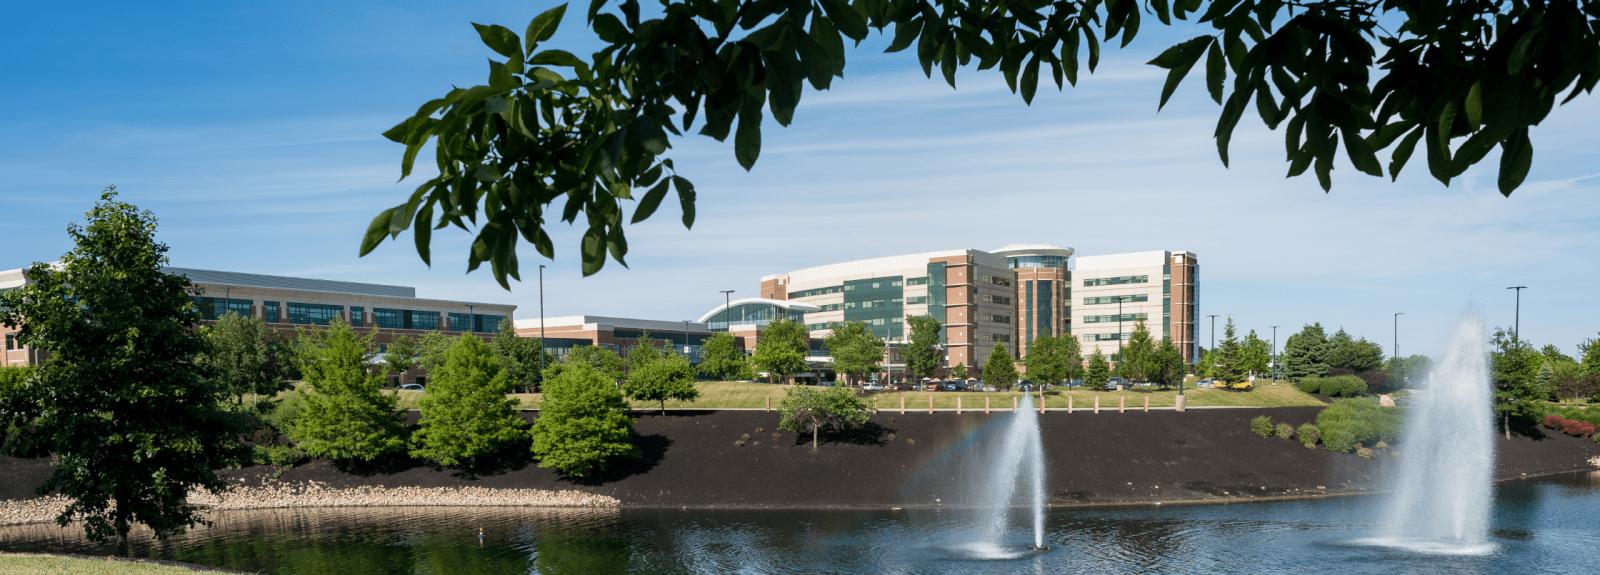 Reid Health's main campus, 1100 Reid Parkway